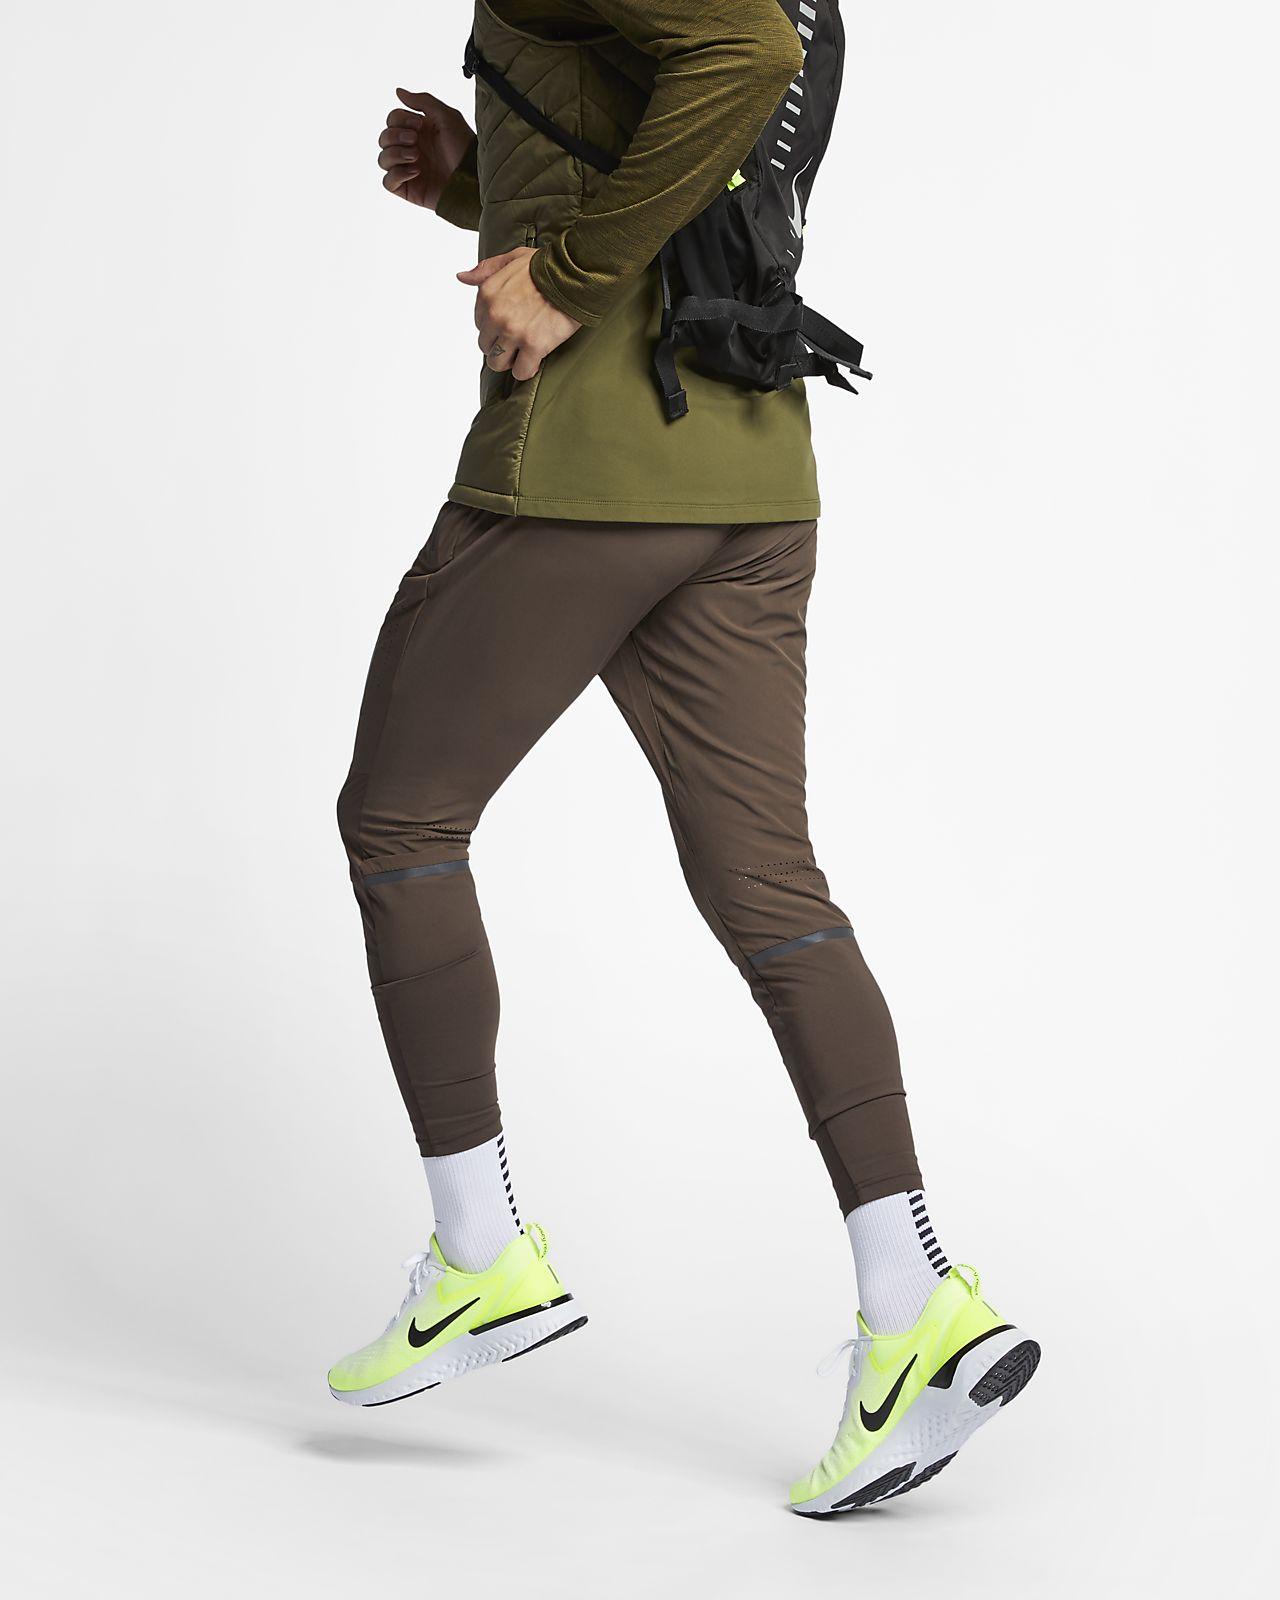 Nike Swift Herren-Laufhose